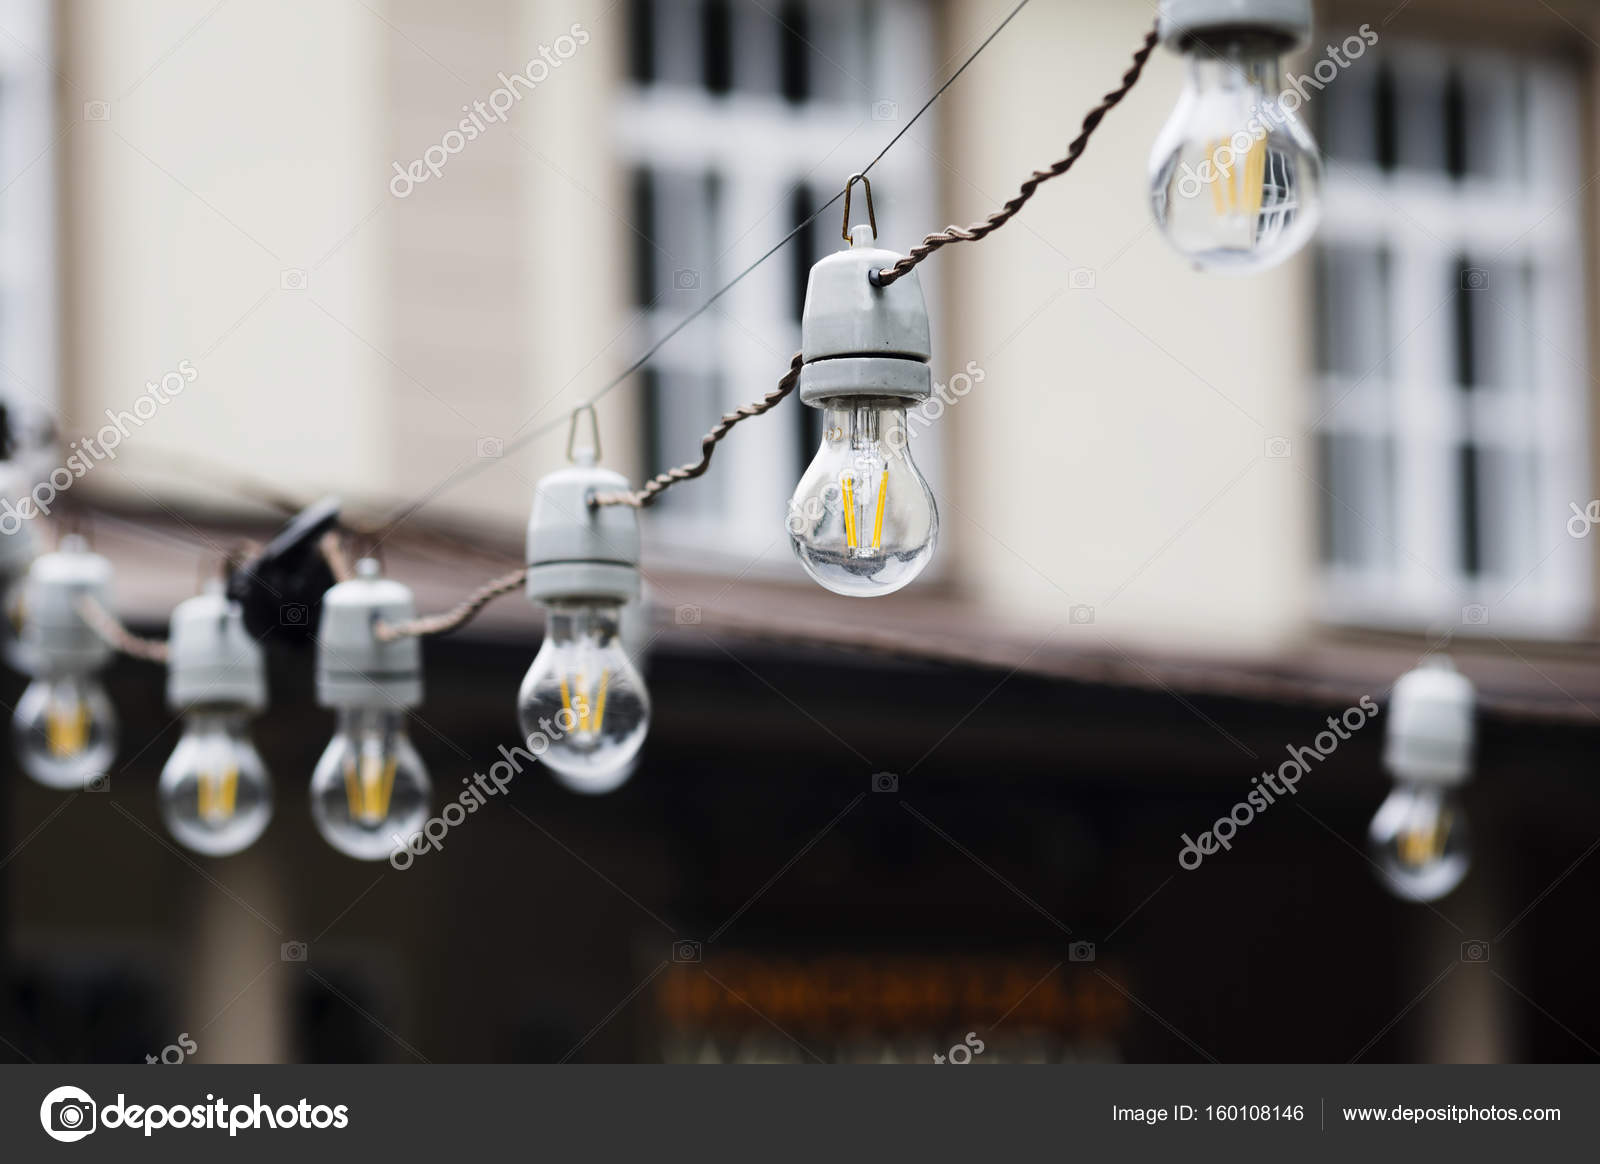 Decorative outdoor string lights stock photo nevada31 160108146 decorative outdoor string lights hanging photo by nevada31 aloadofball Choice Image